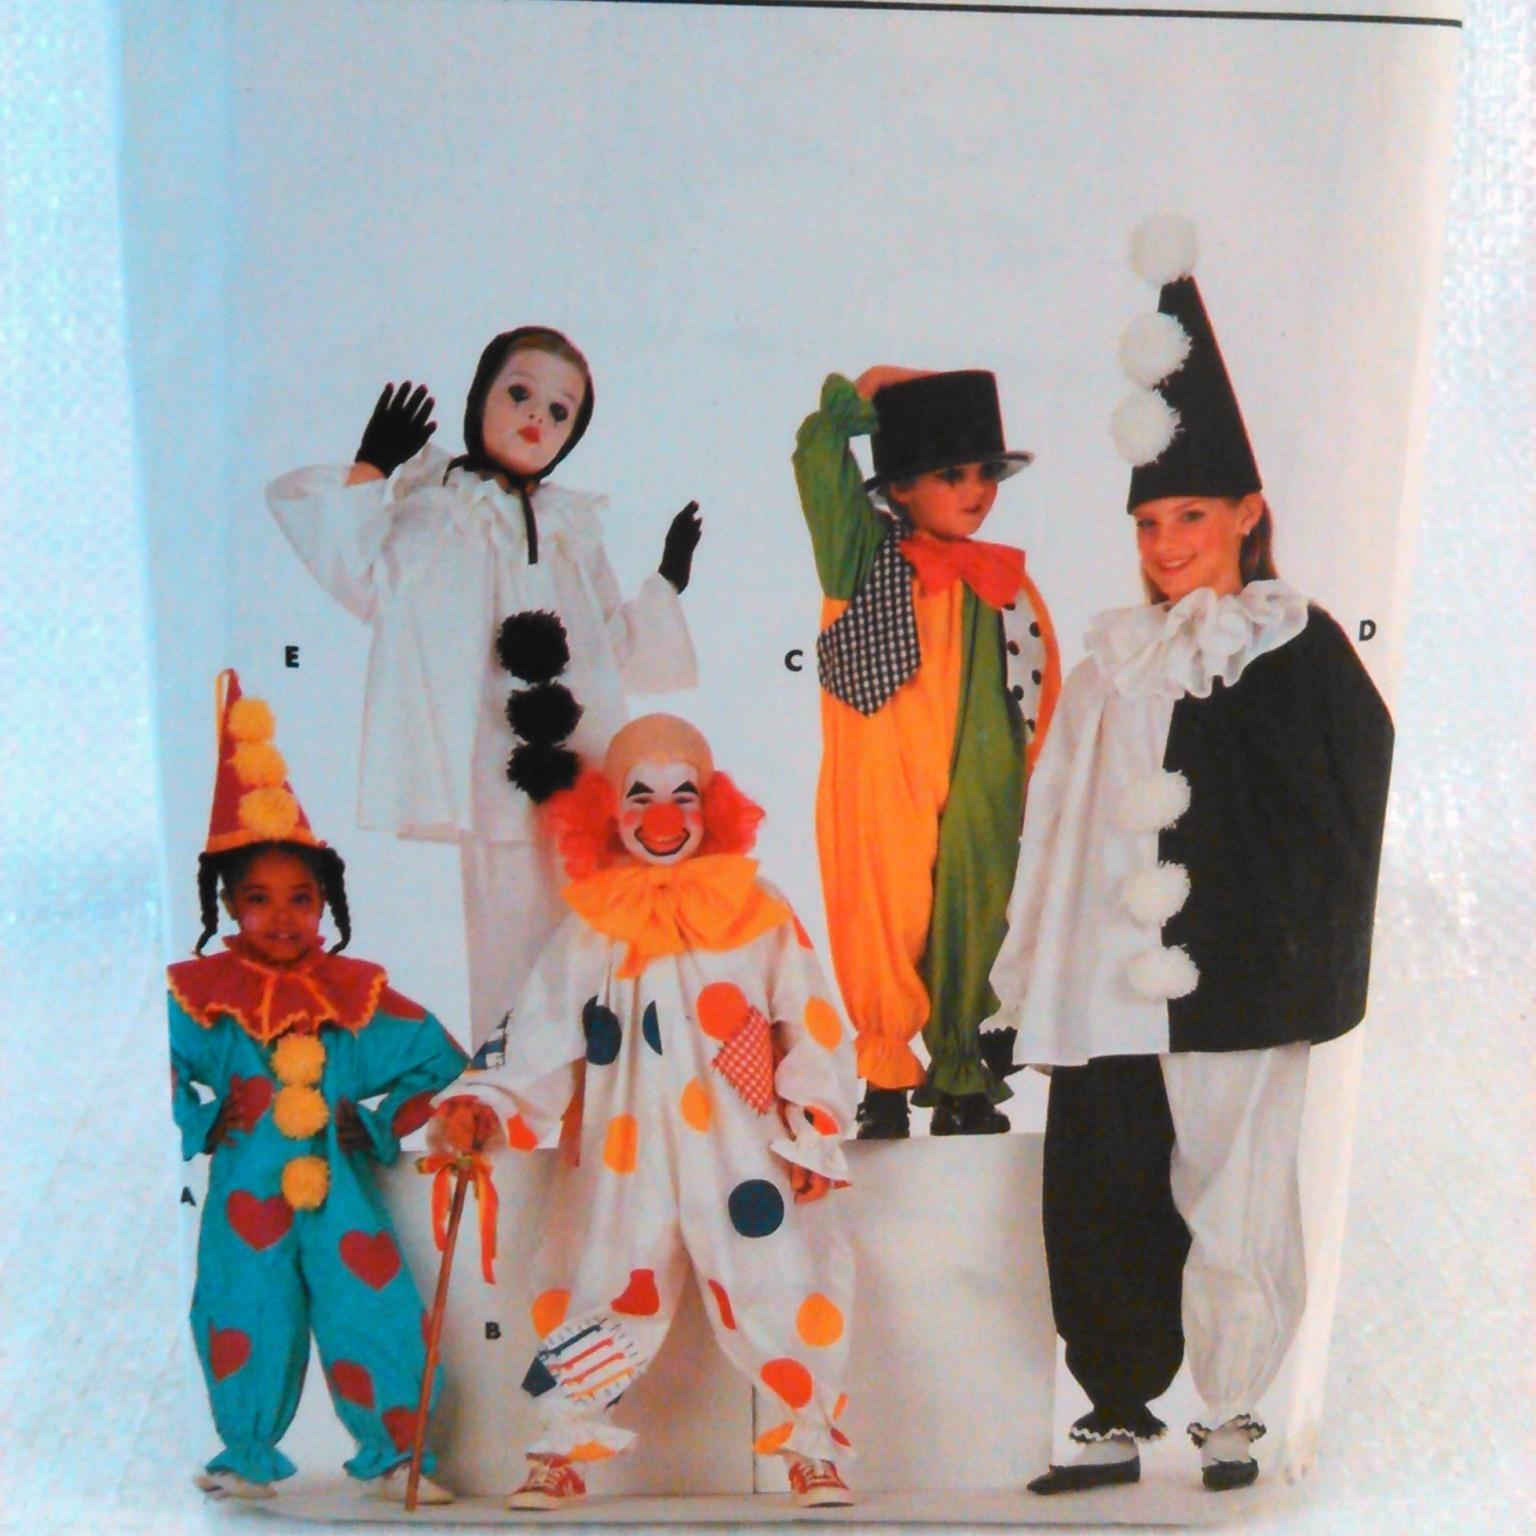 Uncut Child Clown Costume Sewing Pattern S-XL Butterick 4154 G